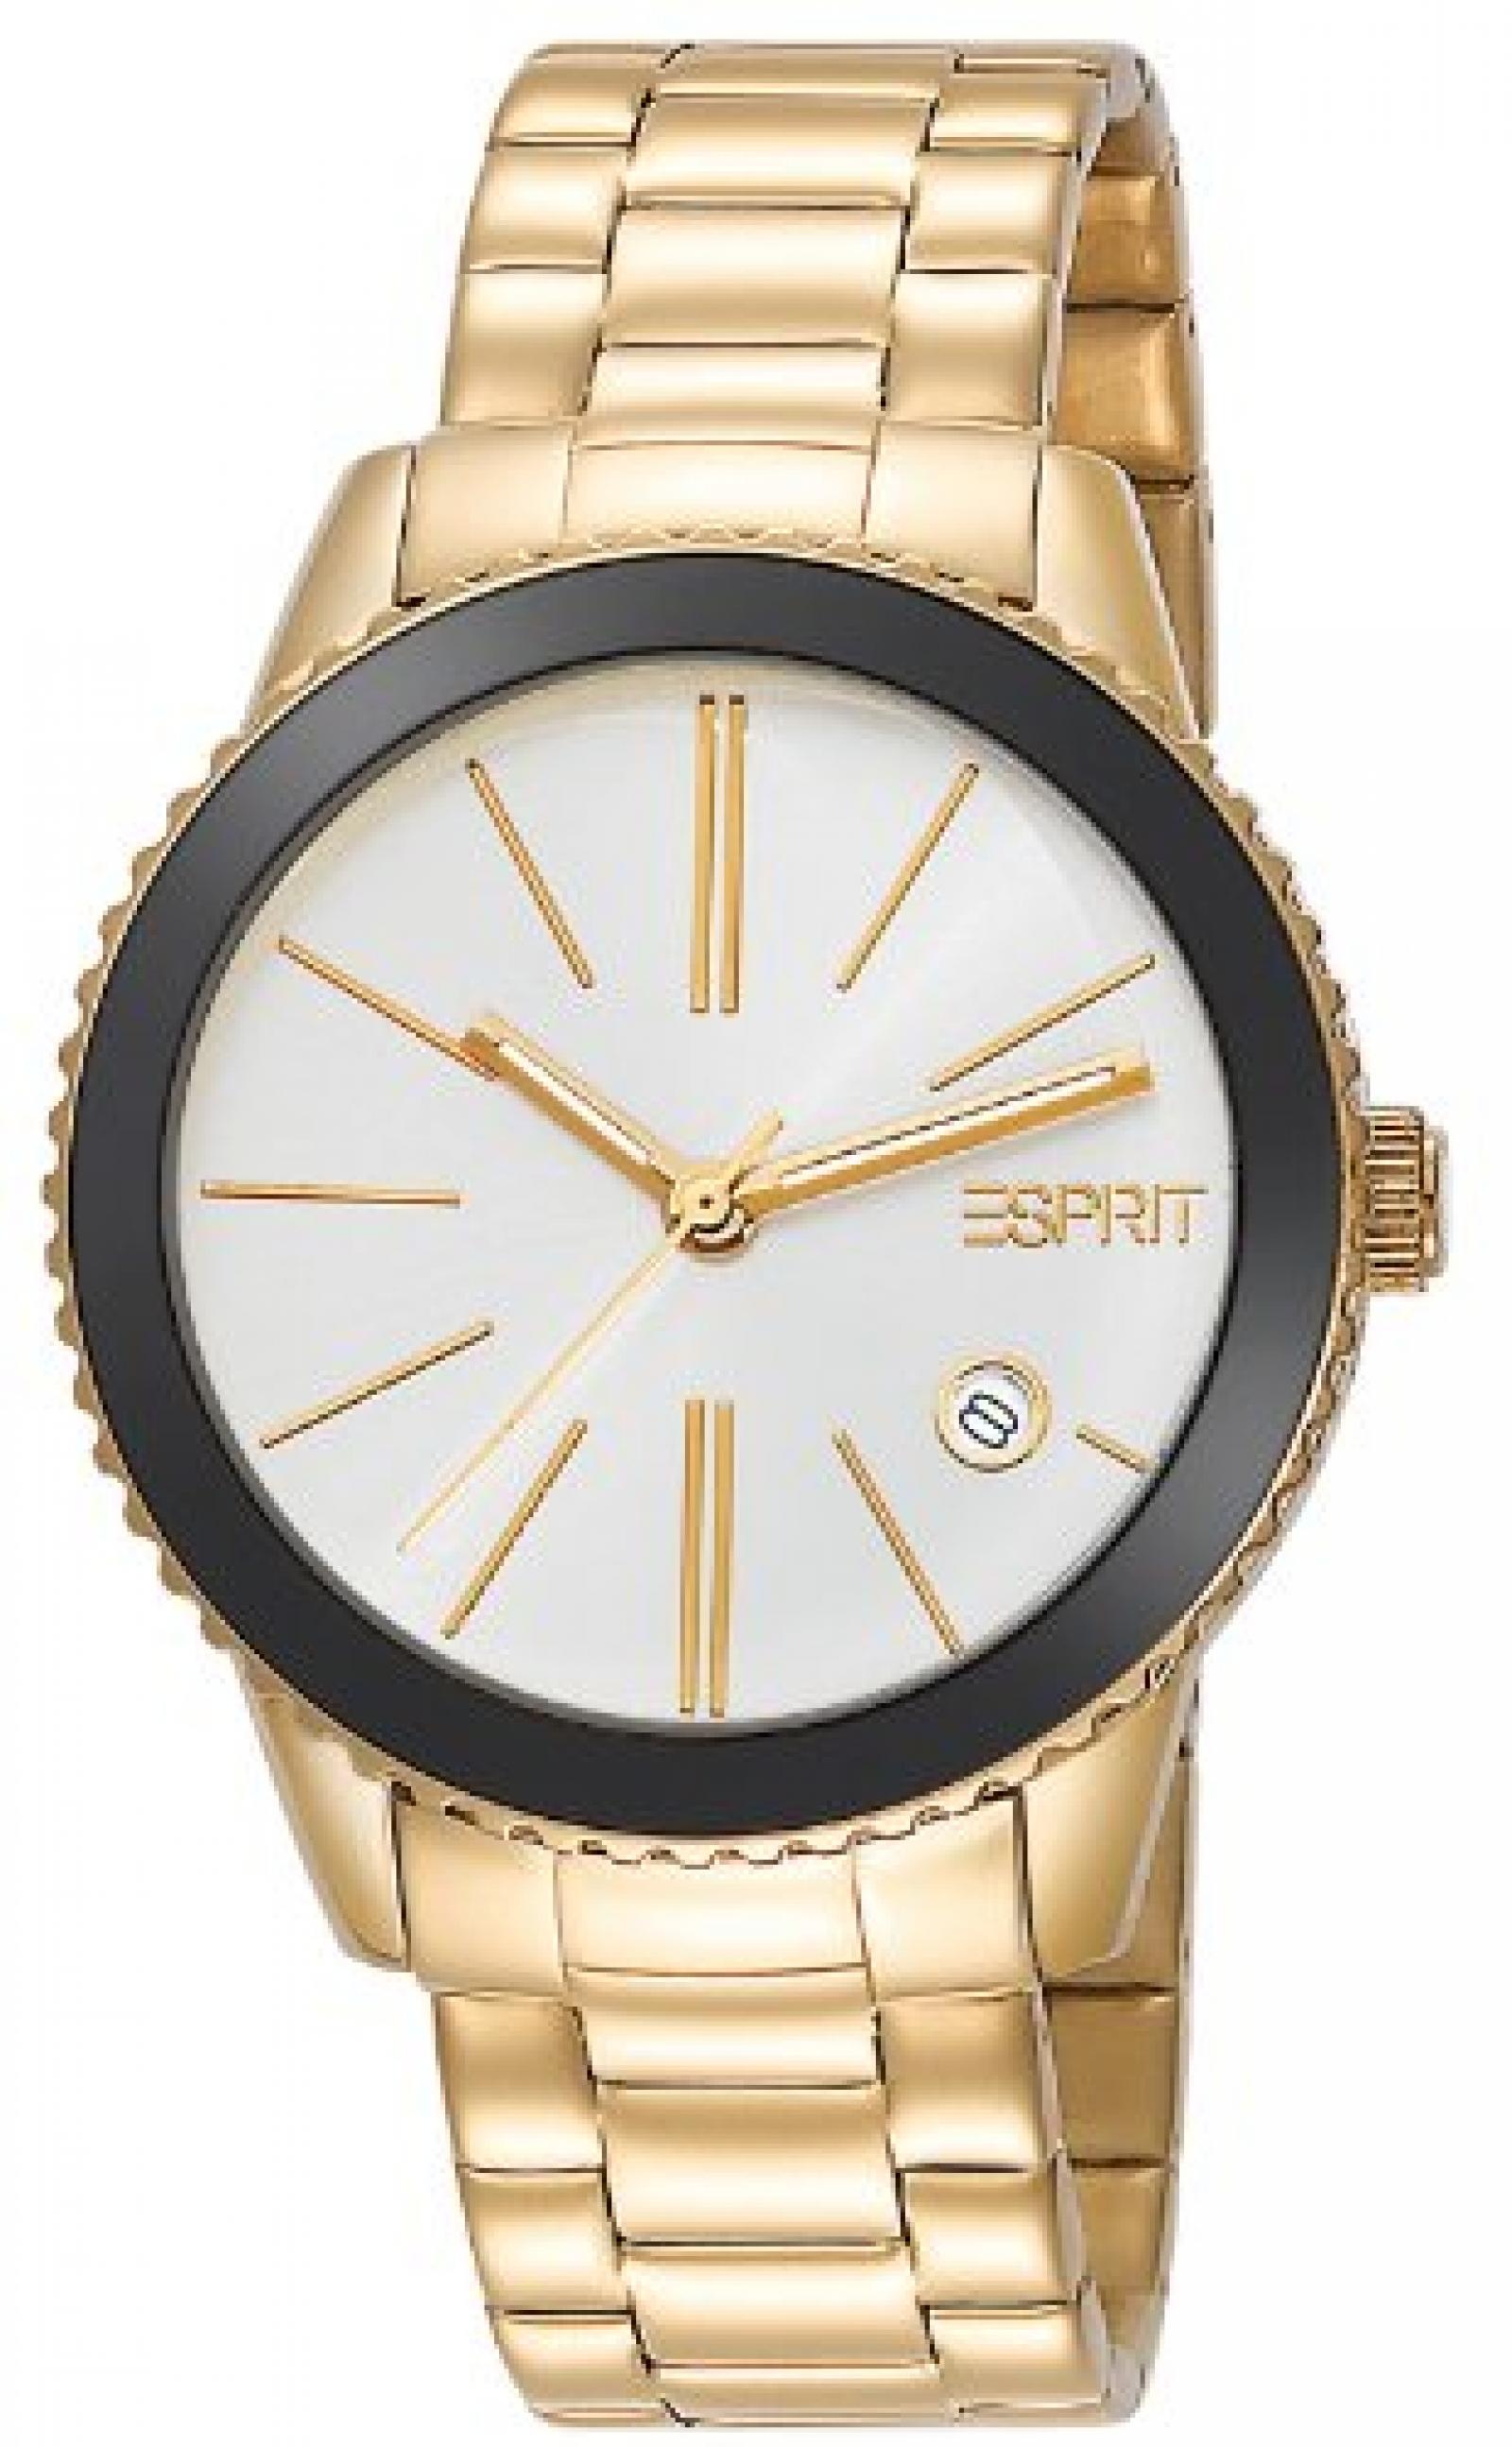 Esprit Damen-Armbanduhr XS Marin Halo Gold Analog Quarz Edelstahl ES105062006